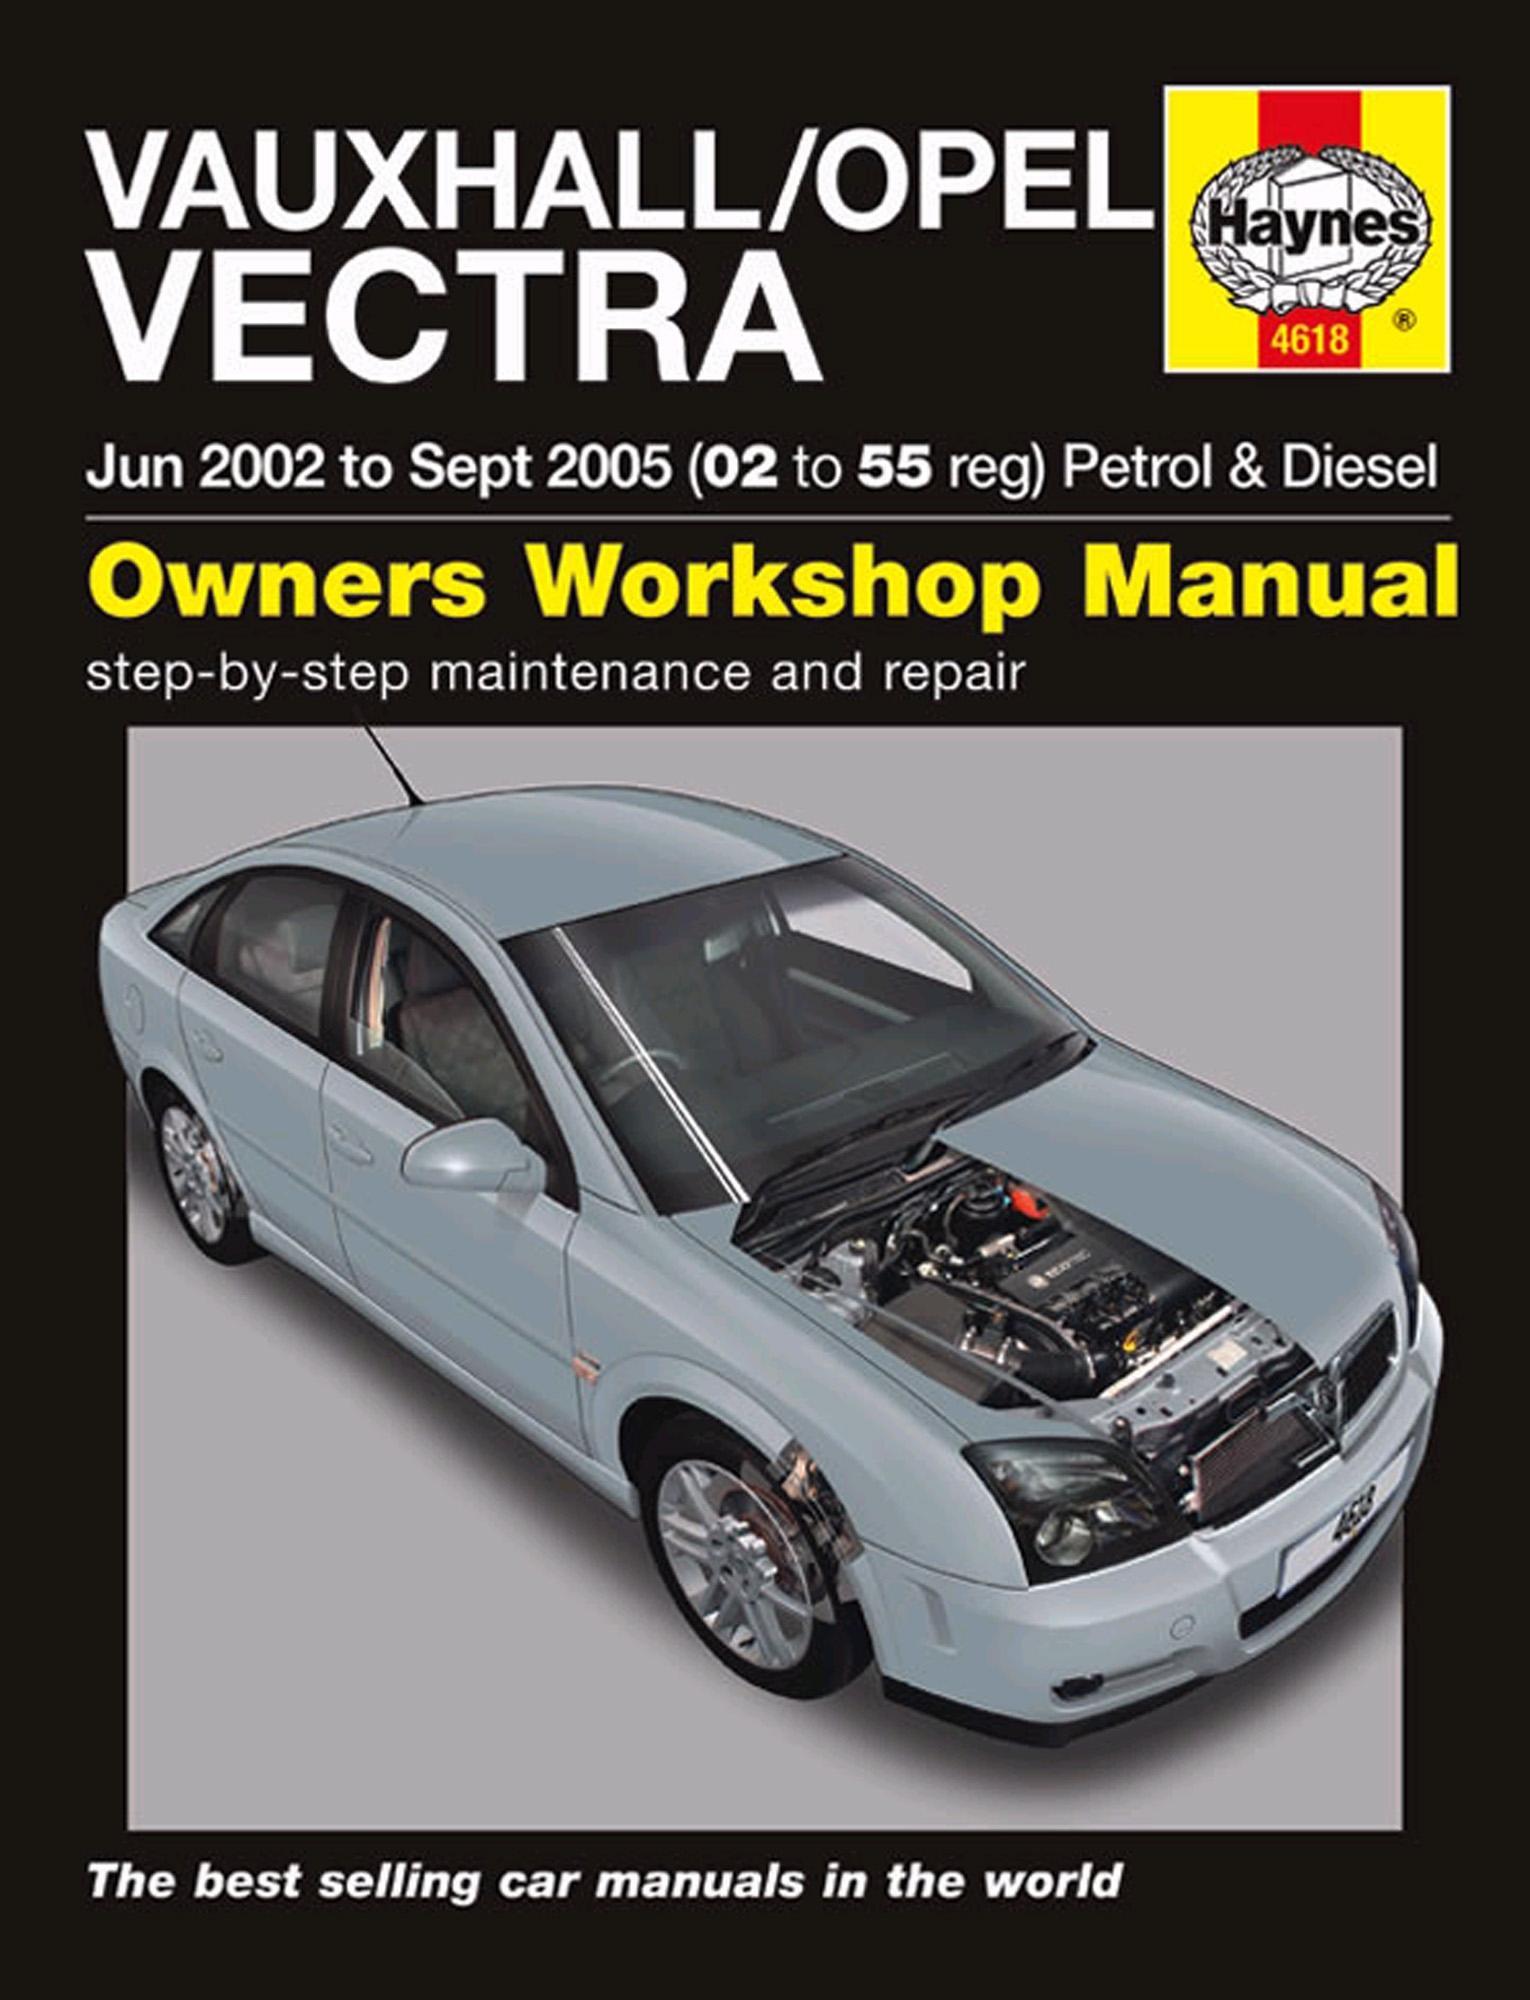 haynes vauxhall vectra june 02 to rh halfords com Haynes Repair Manuals PDF Haynes Repair Manual Online View